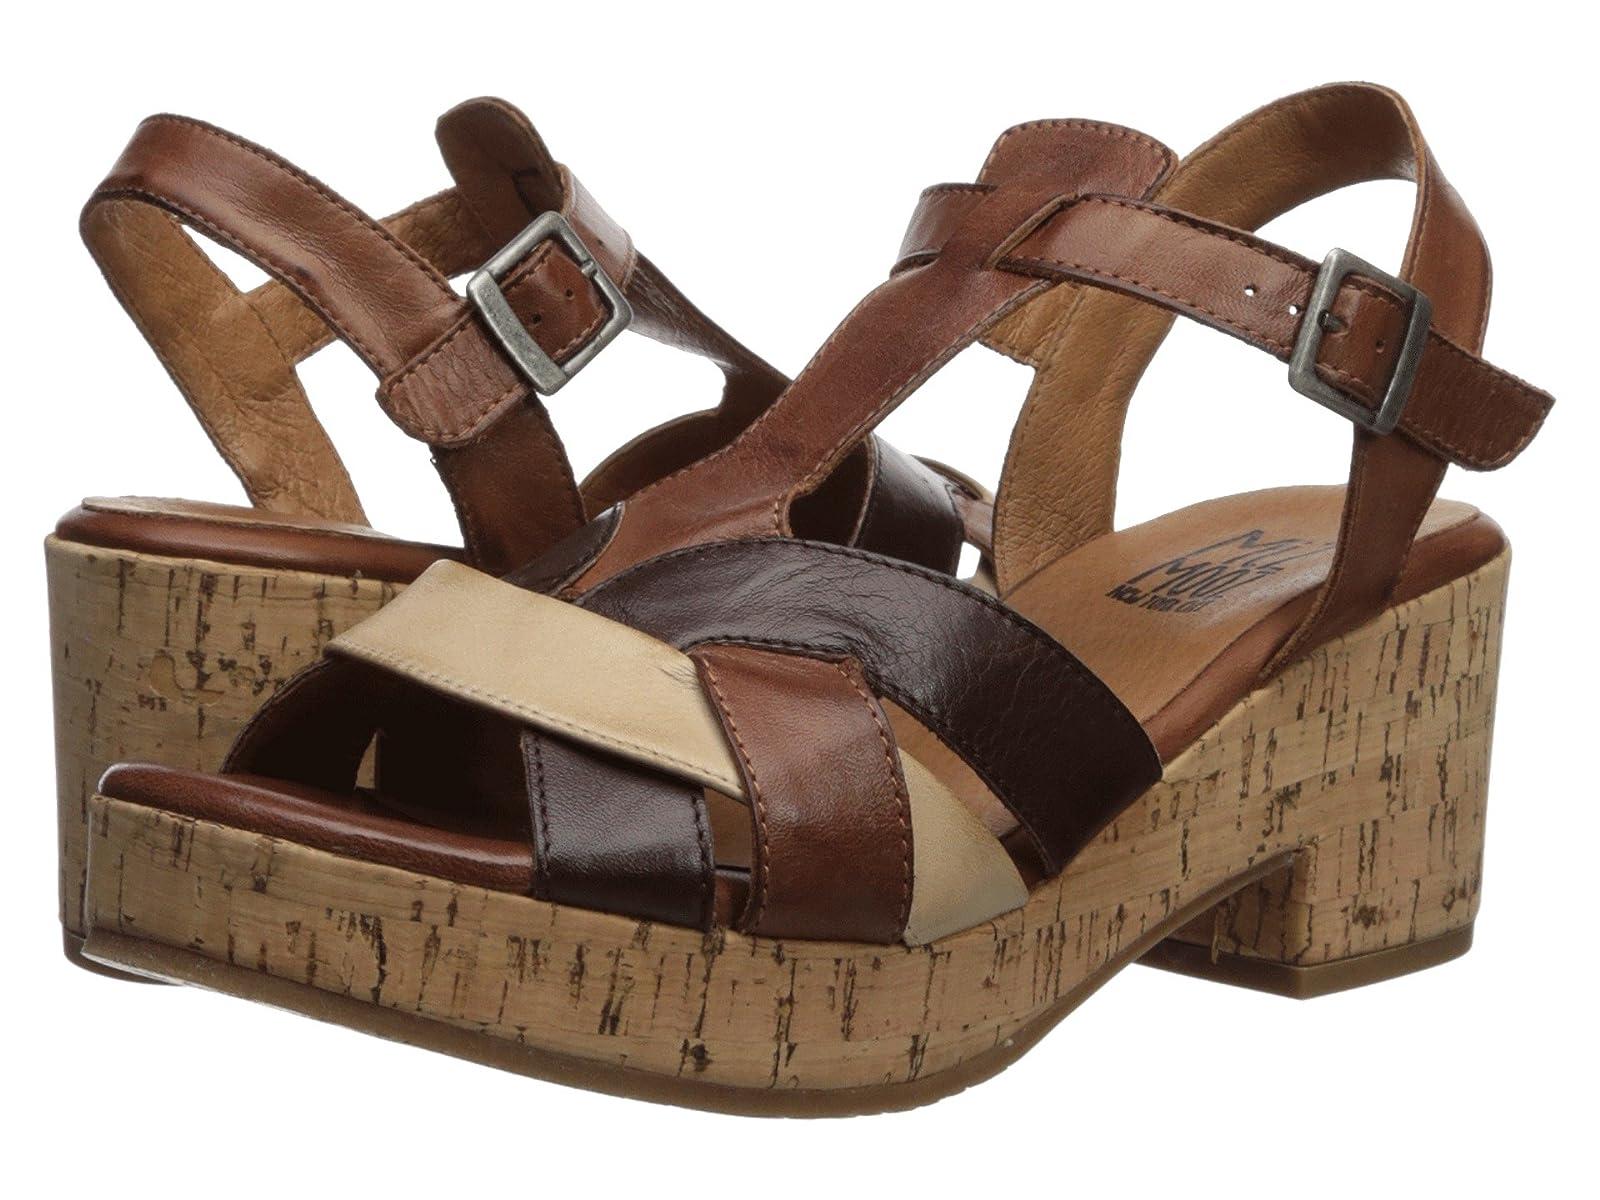 Miz Mooz CabanaAtmospheric grades have affordable shoes